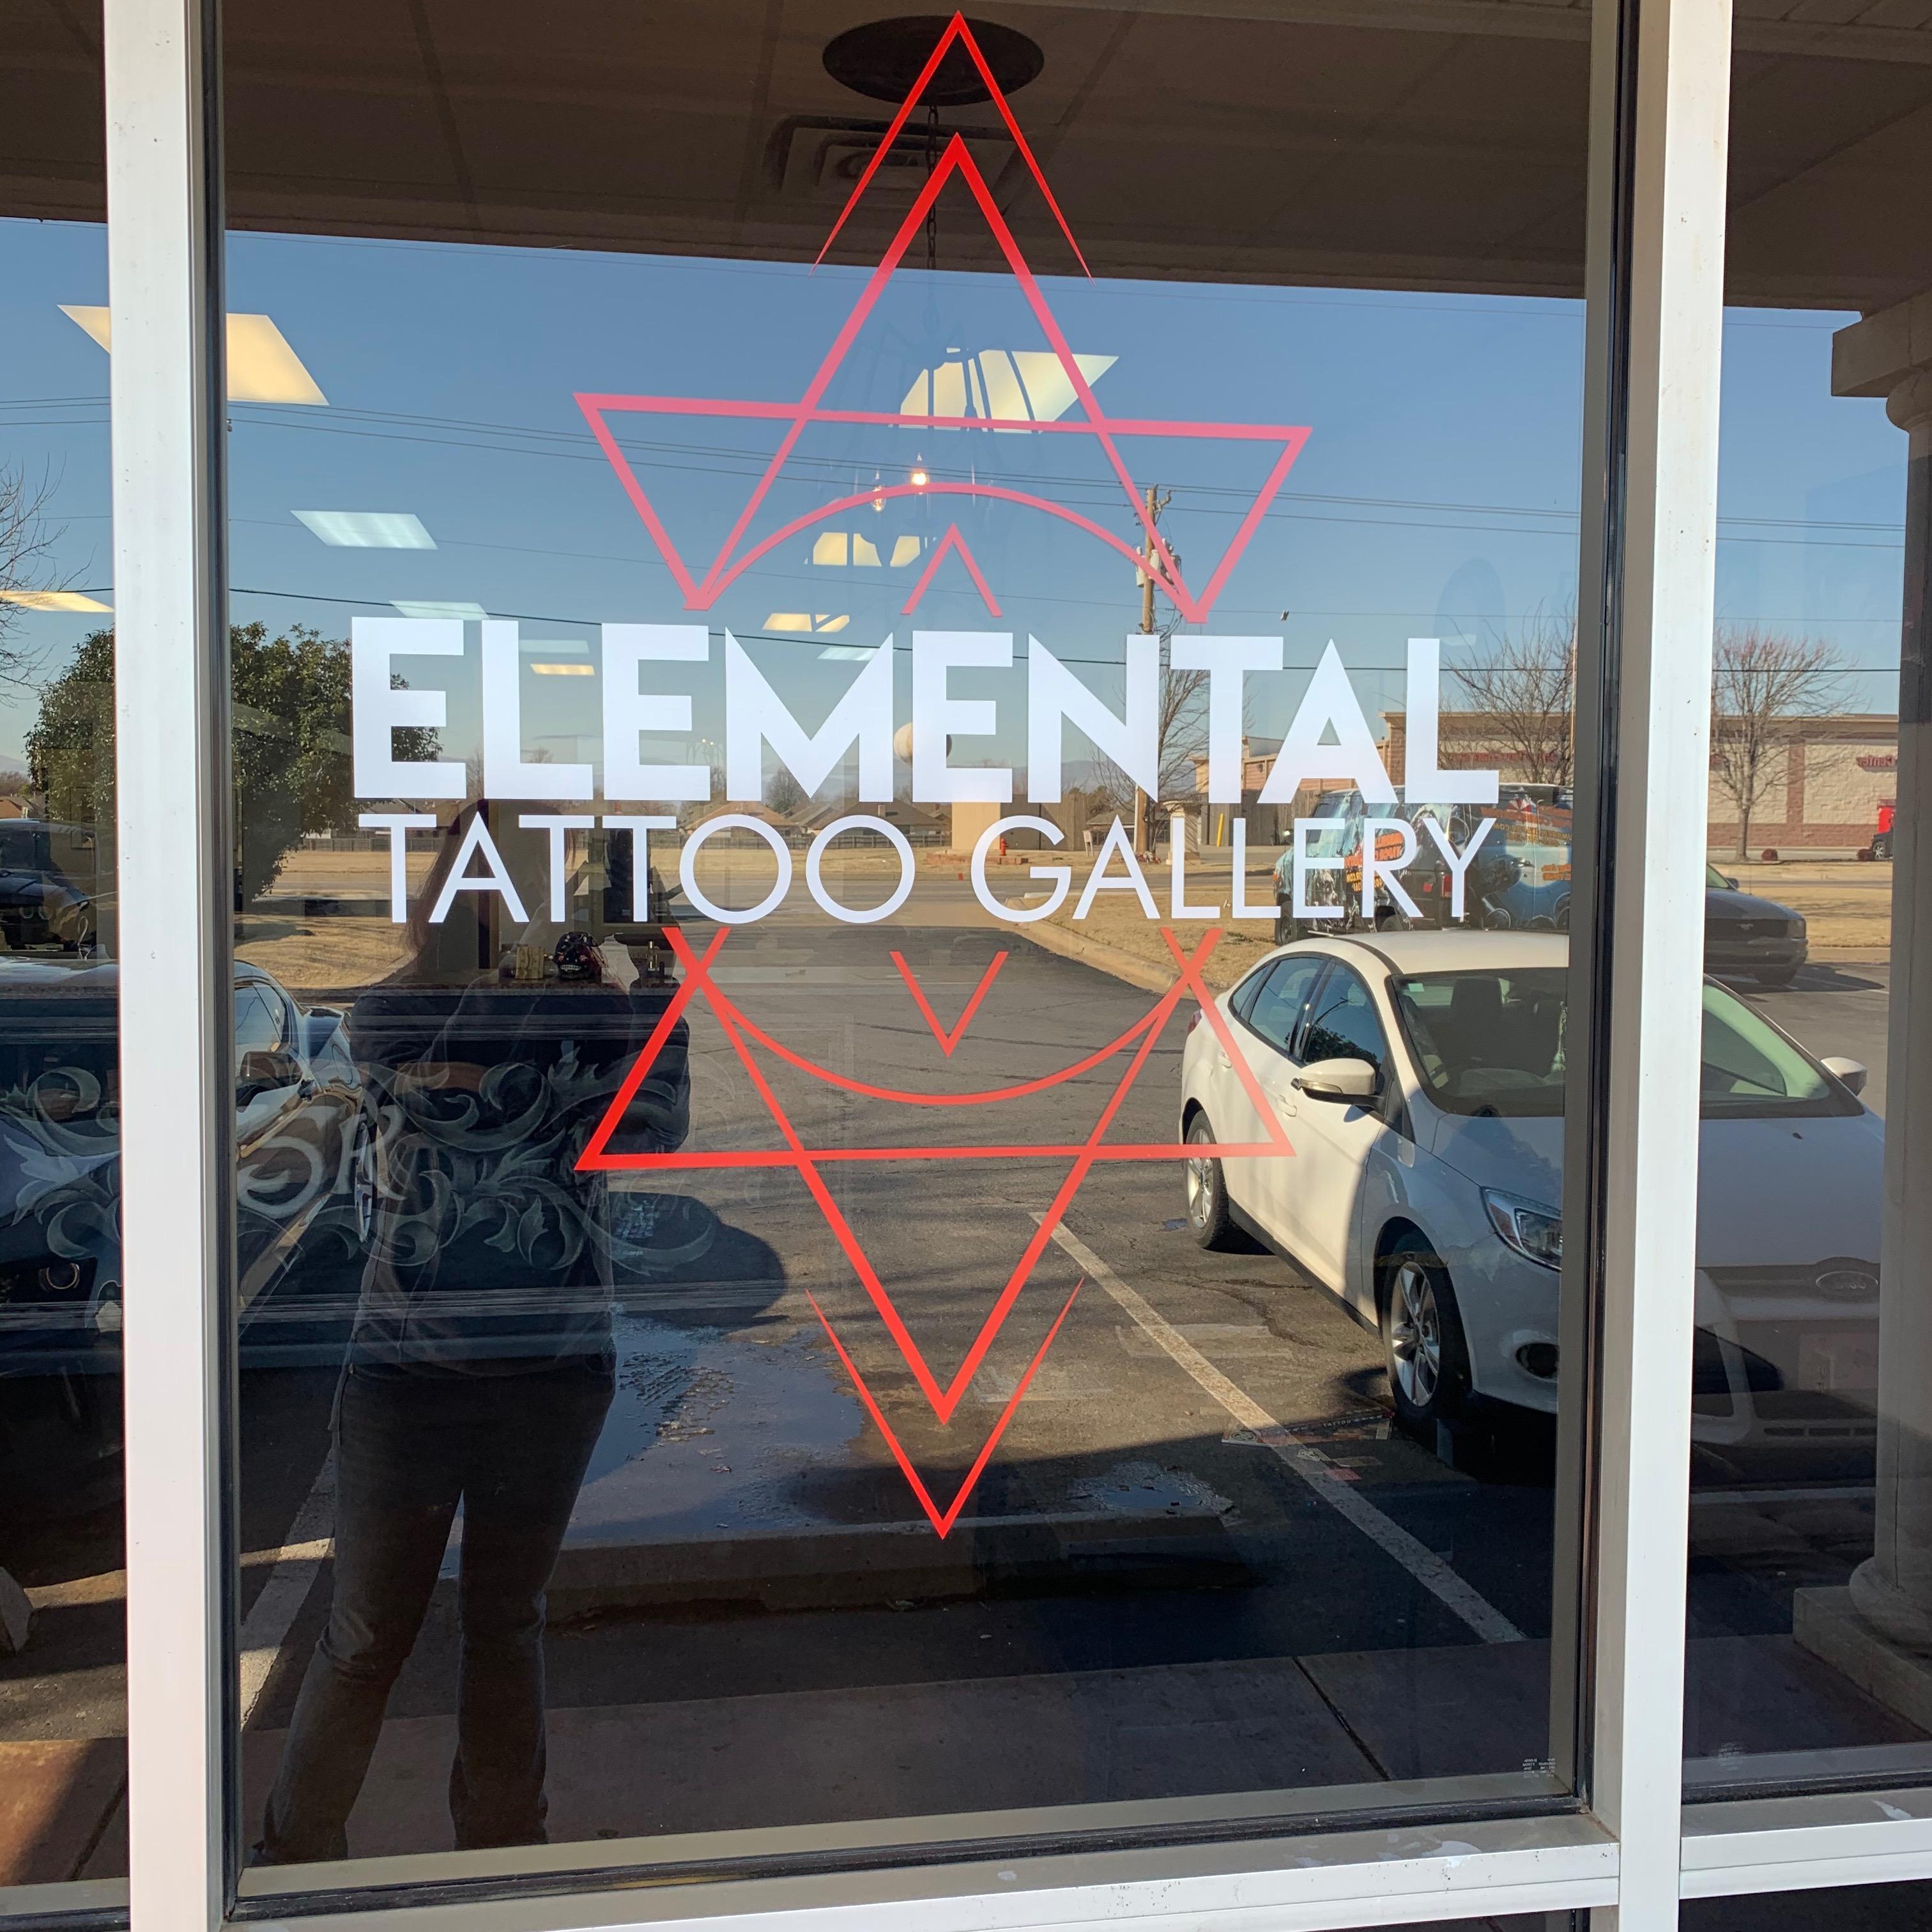 elemental tattoo gallery